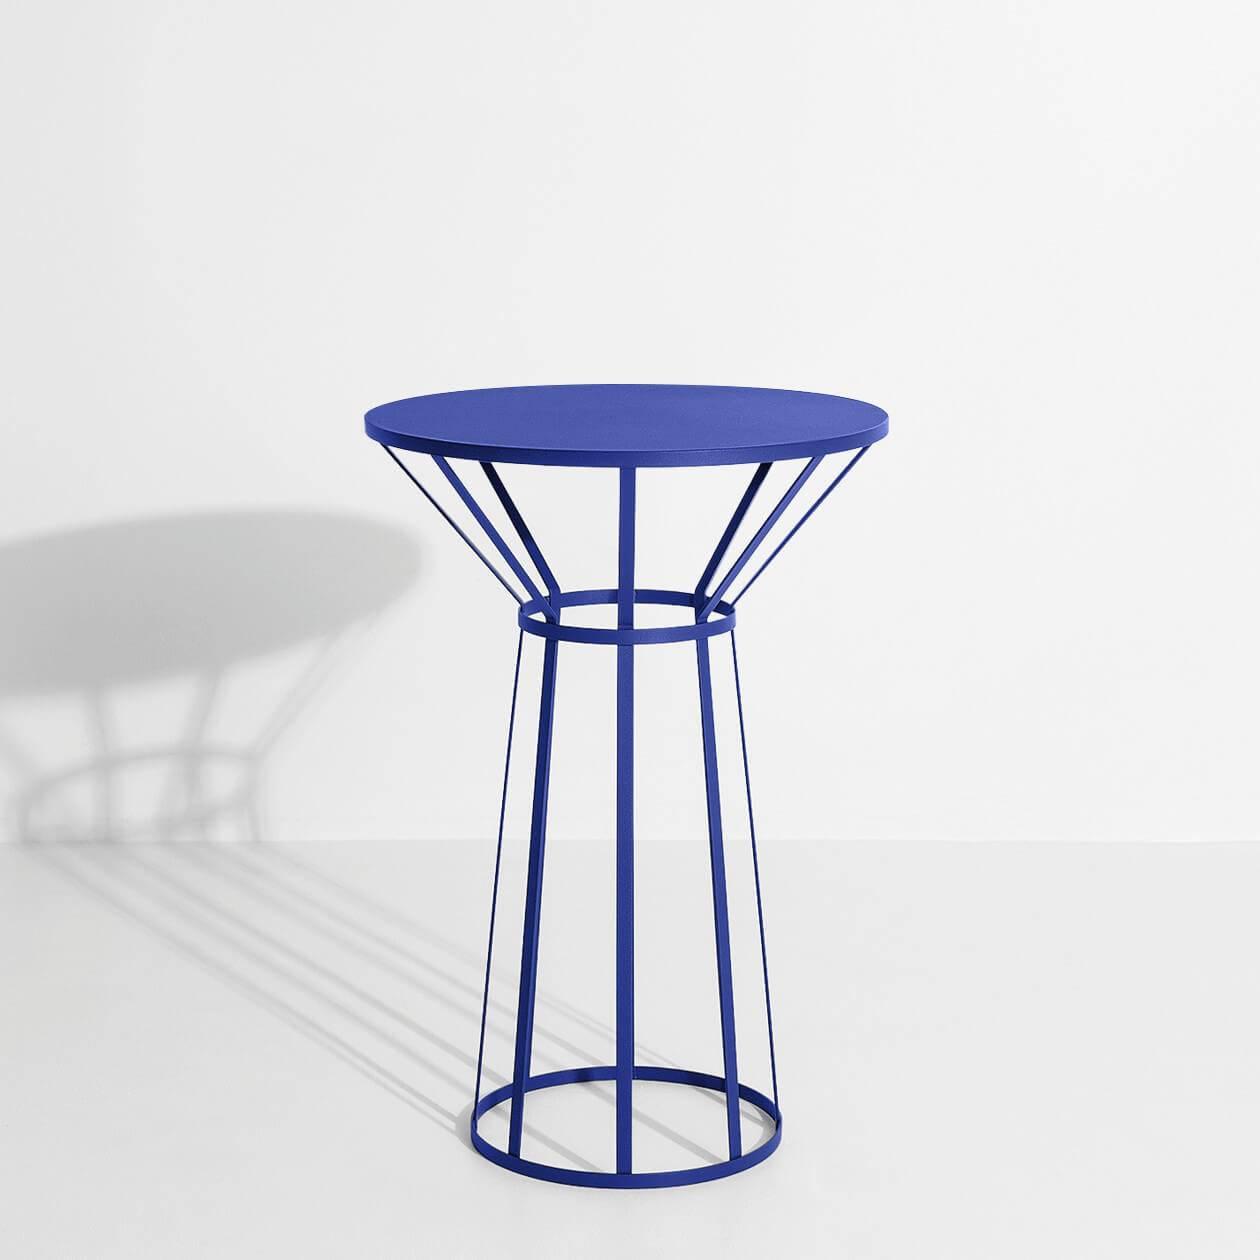 Guéridon design bleu Hollo - Petite Friture